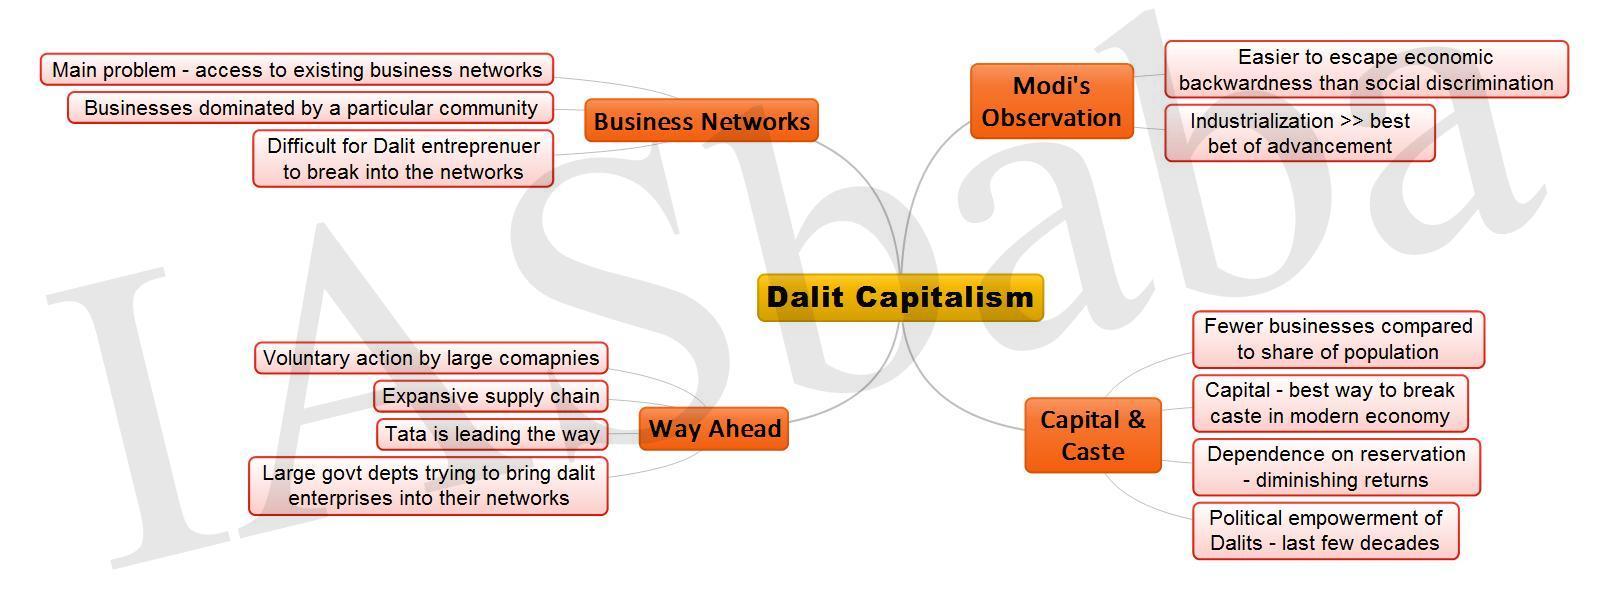 Dalit Capitalism JPEG